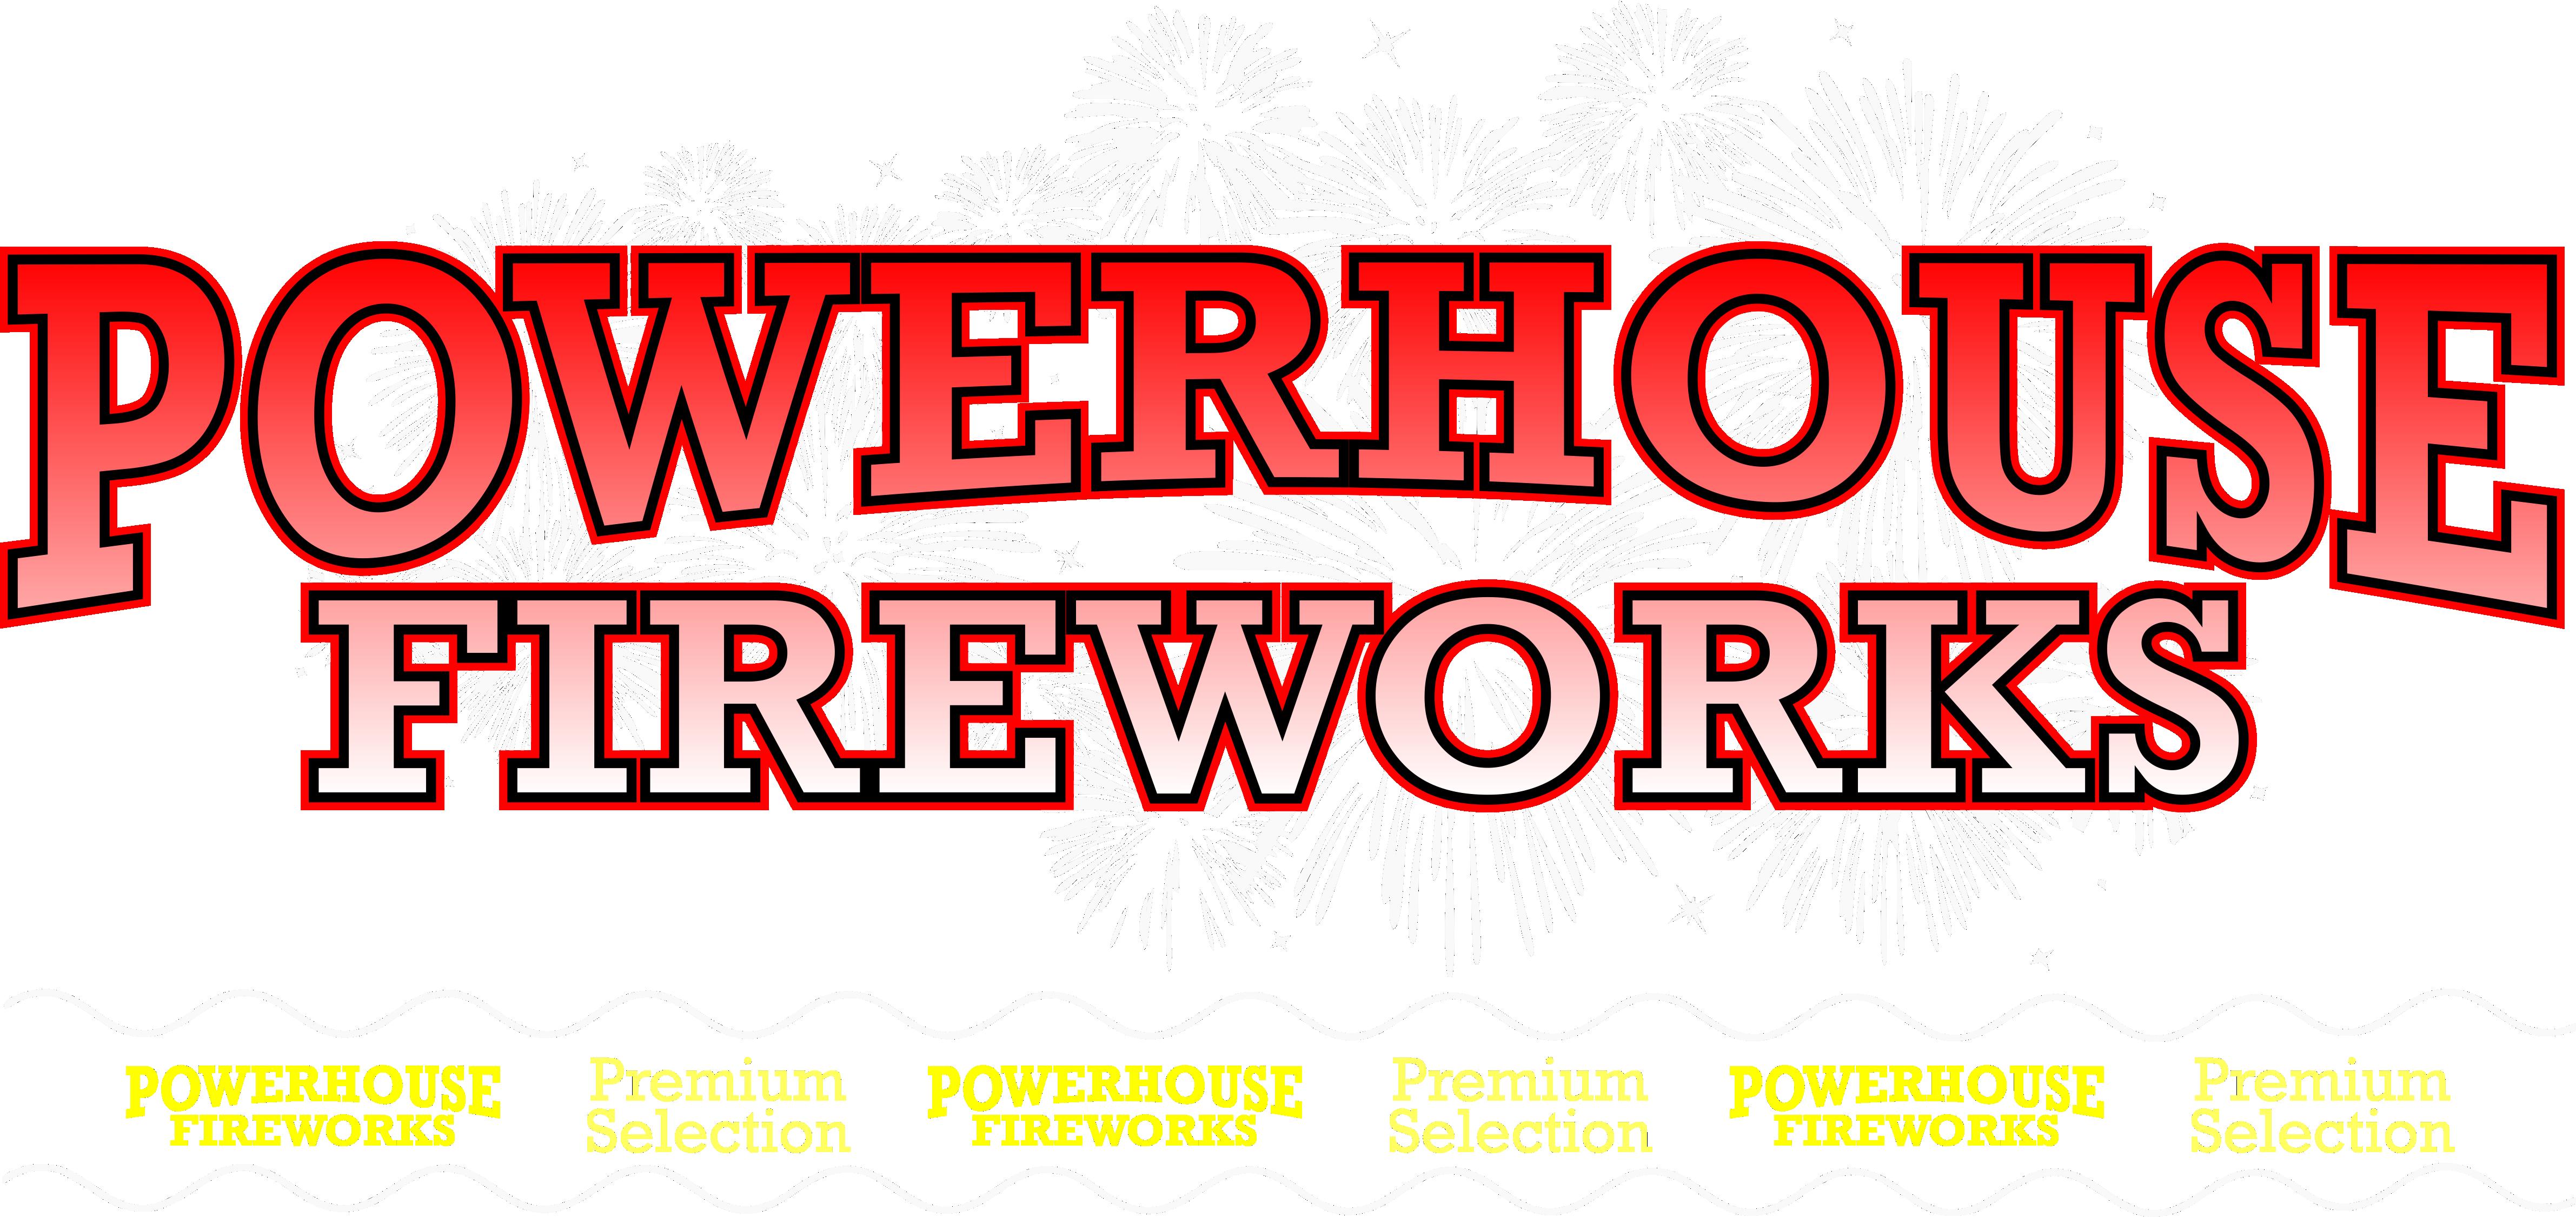 Sarnia - Beside the Beer Store - Powerhouse Fireworks